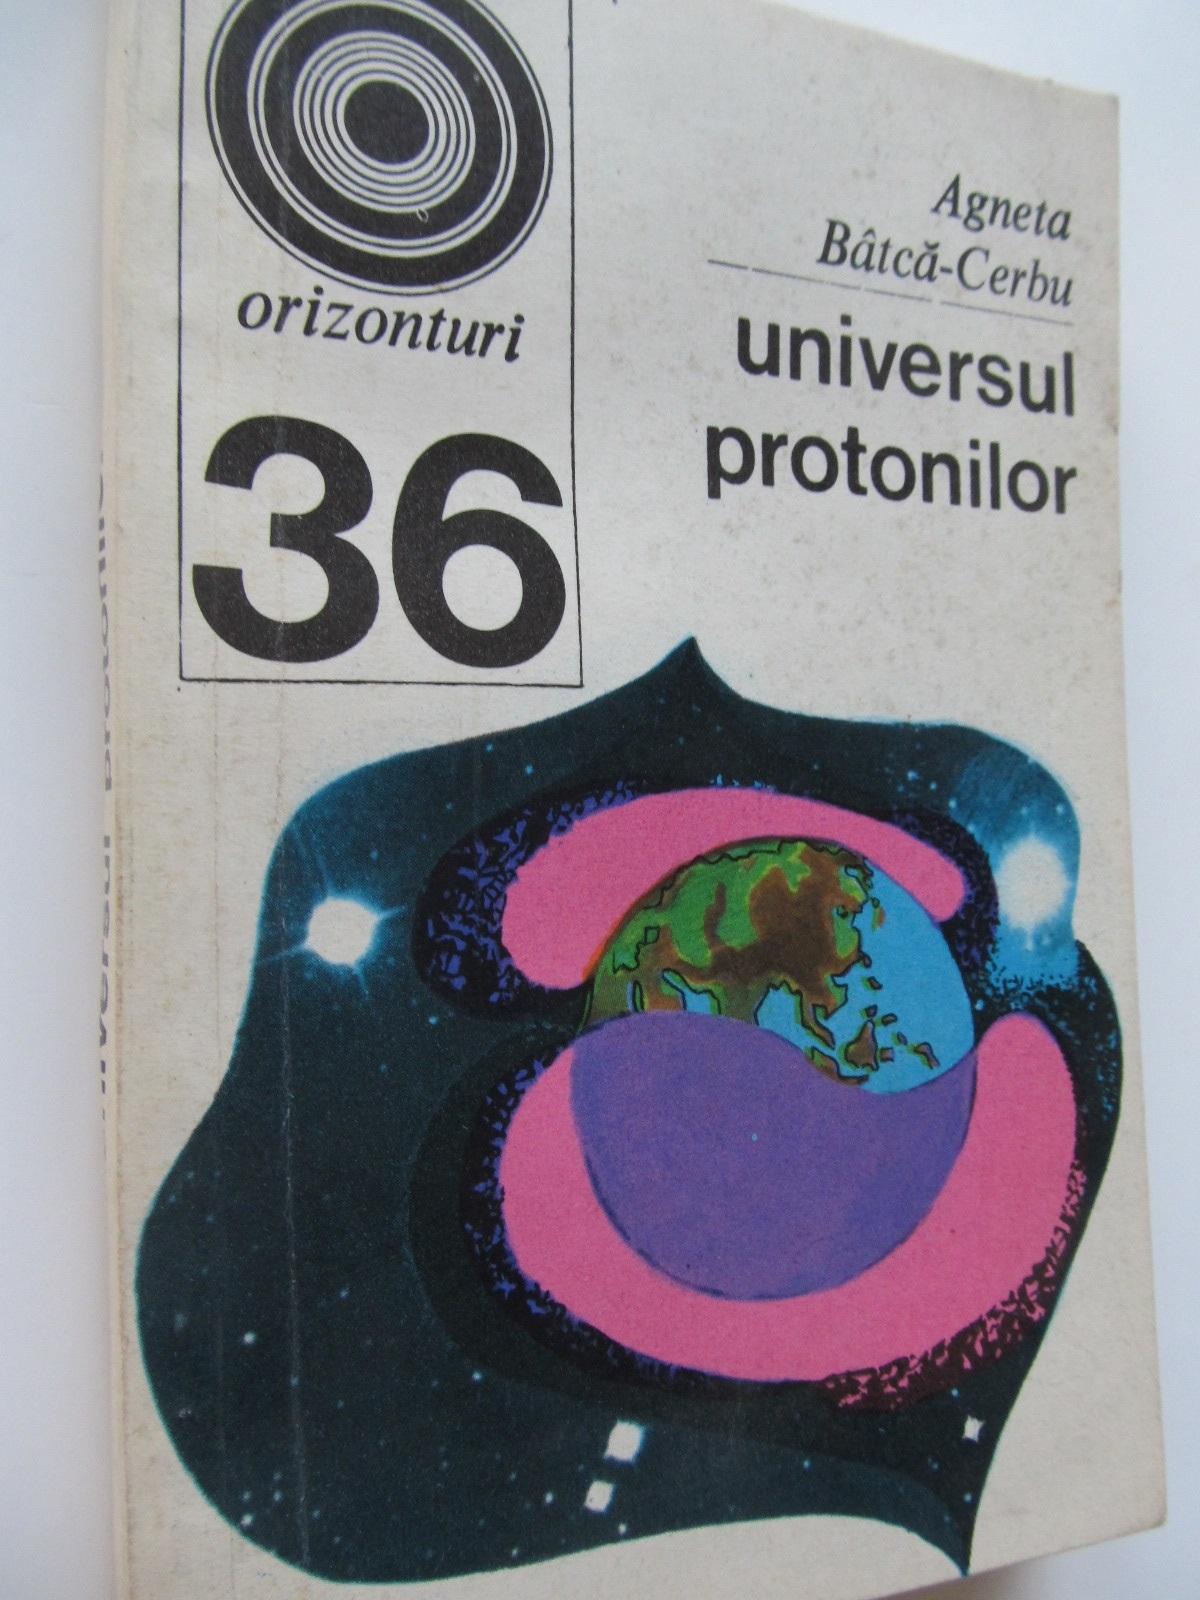 Universul protonilor (36) - Agneta Batca Cerbu | Detalii carte